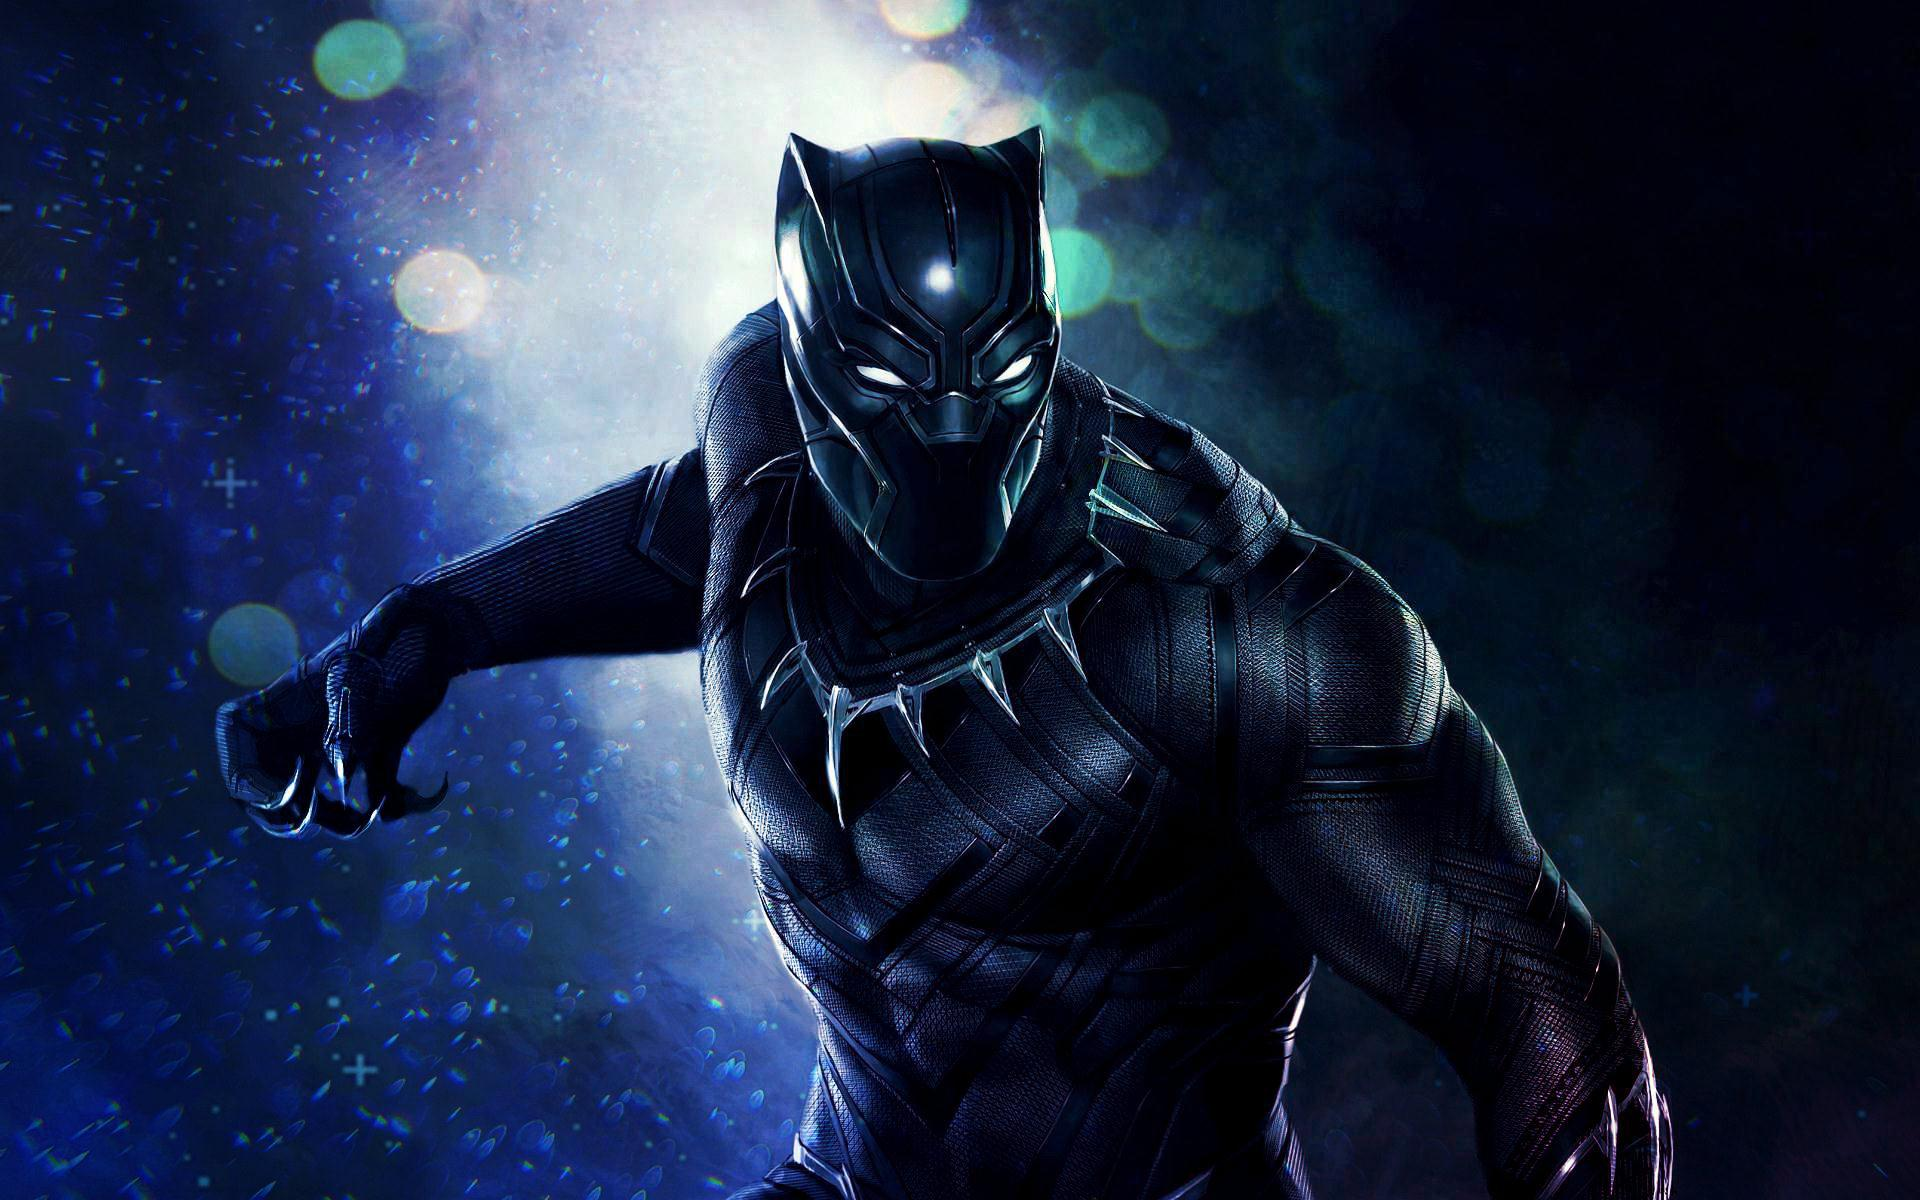 Black Panther 2017 Movie Desktop HD Wallpaper   Stylish HD Wallpapers 1920x1200